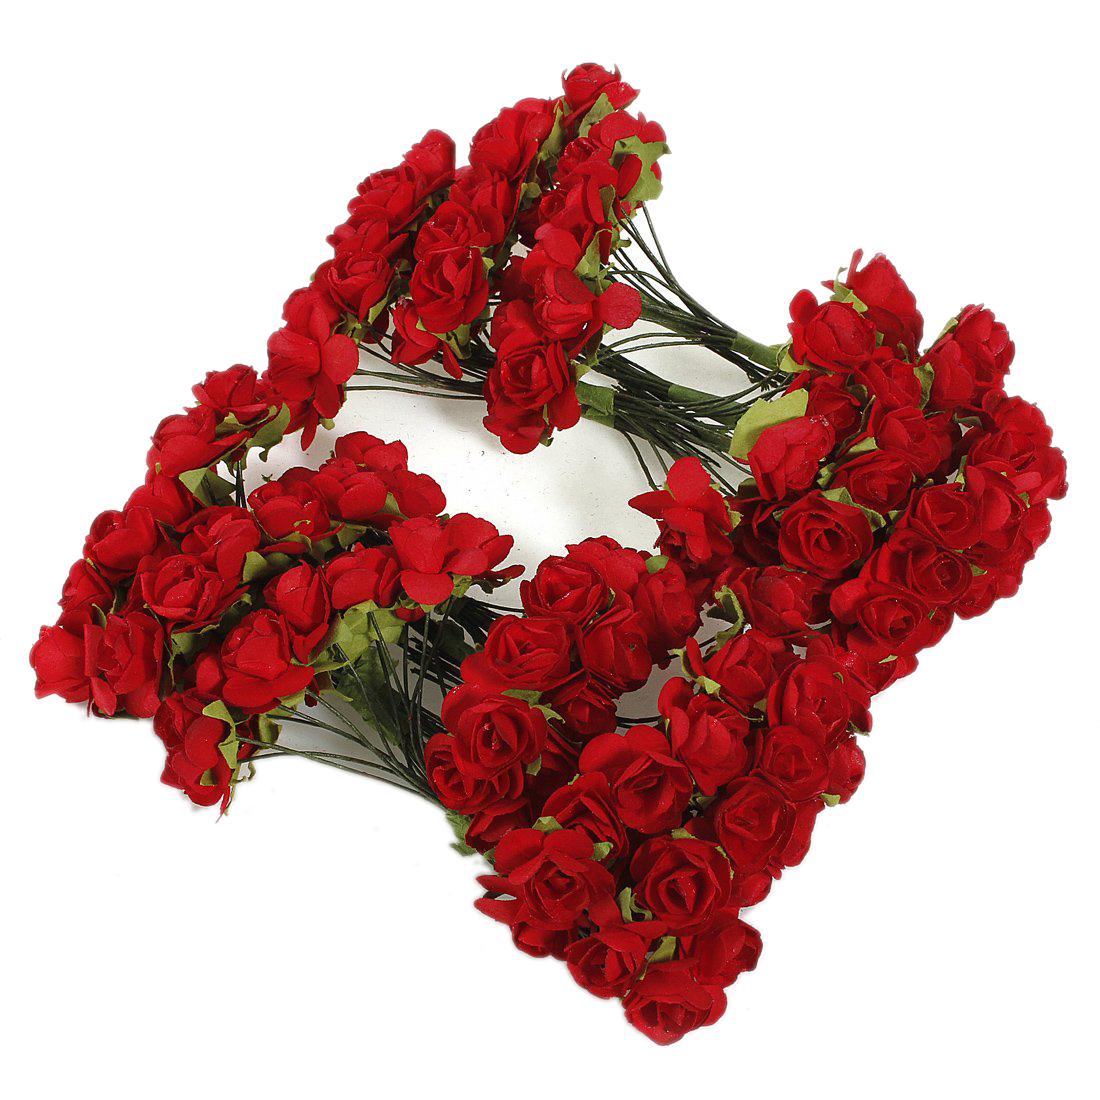 144 X Artificial Paper Red Rose Flower Wedding Craft Decor H6o6 A7m4